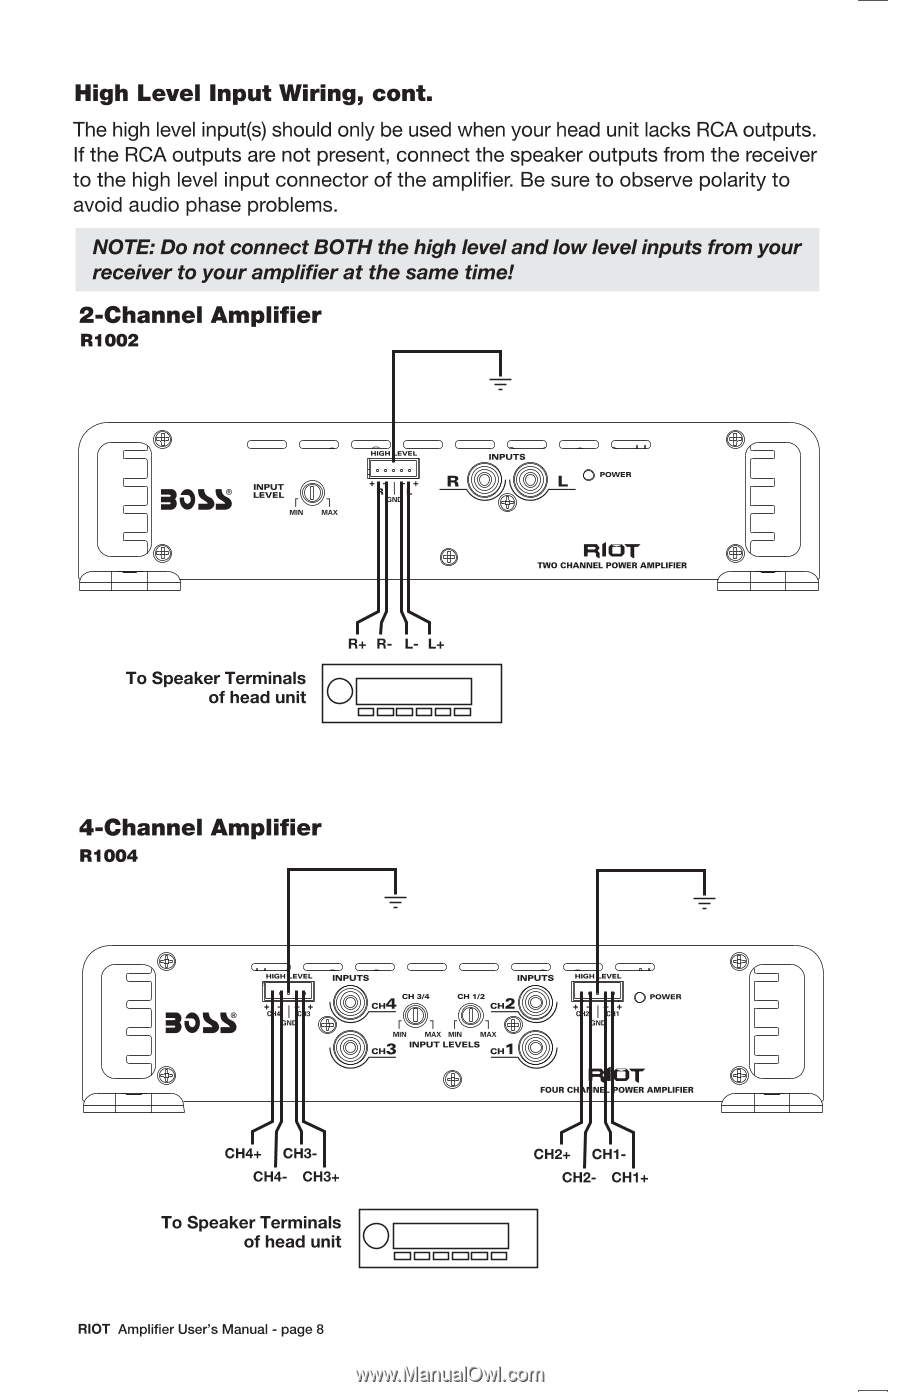 medium resolution of  boss r1004 wiring diagram wiring diagram schematics on boss amp manual boss car radio